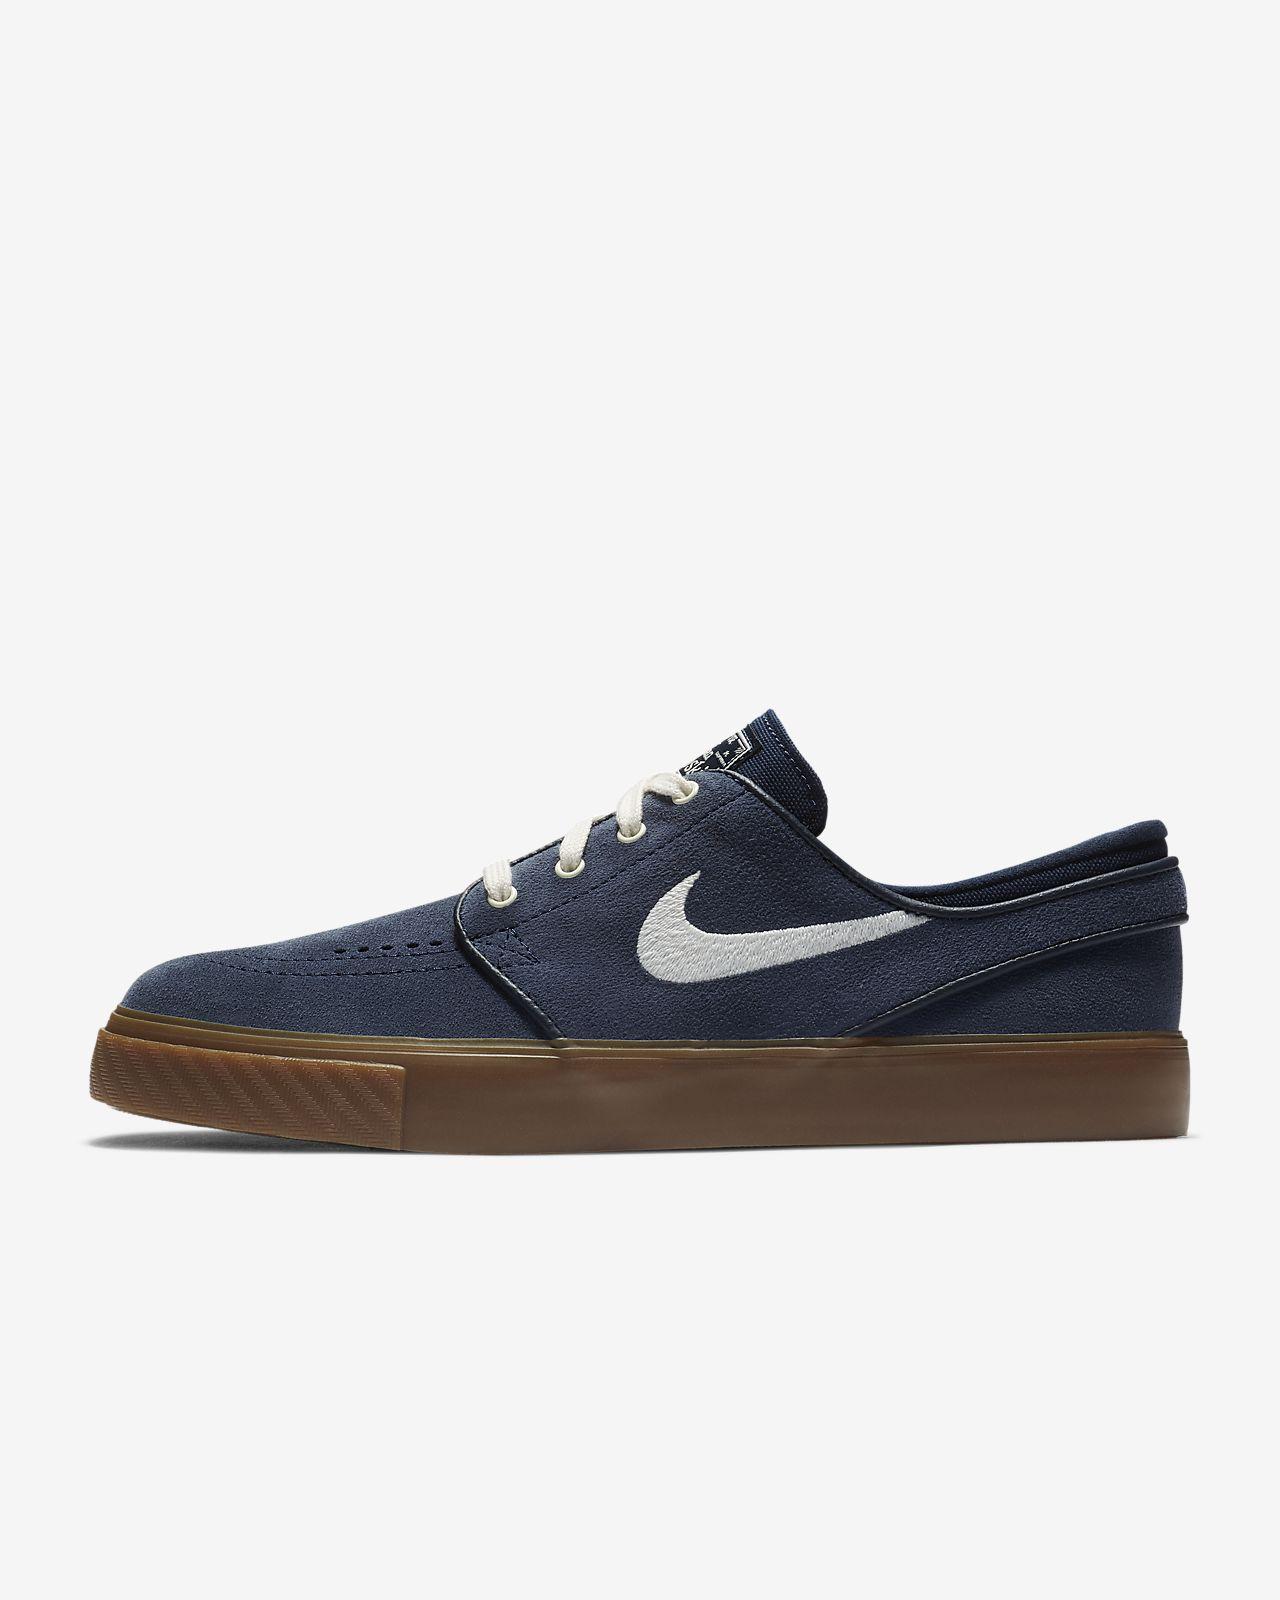 promo code 906cd 63b1b Nike Zoom Stefan Janoski